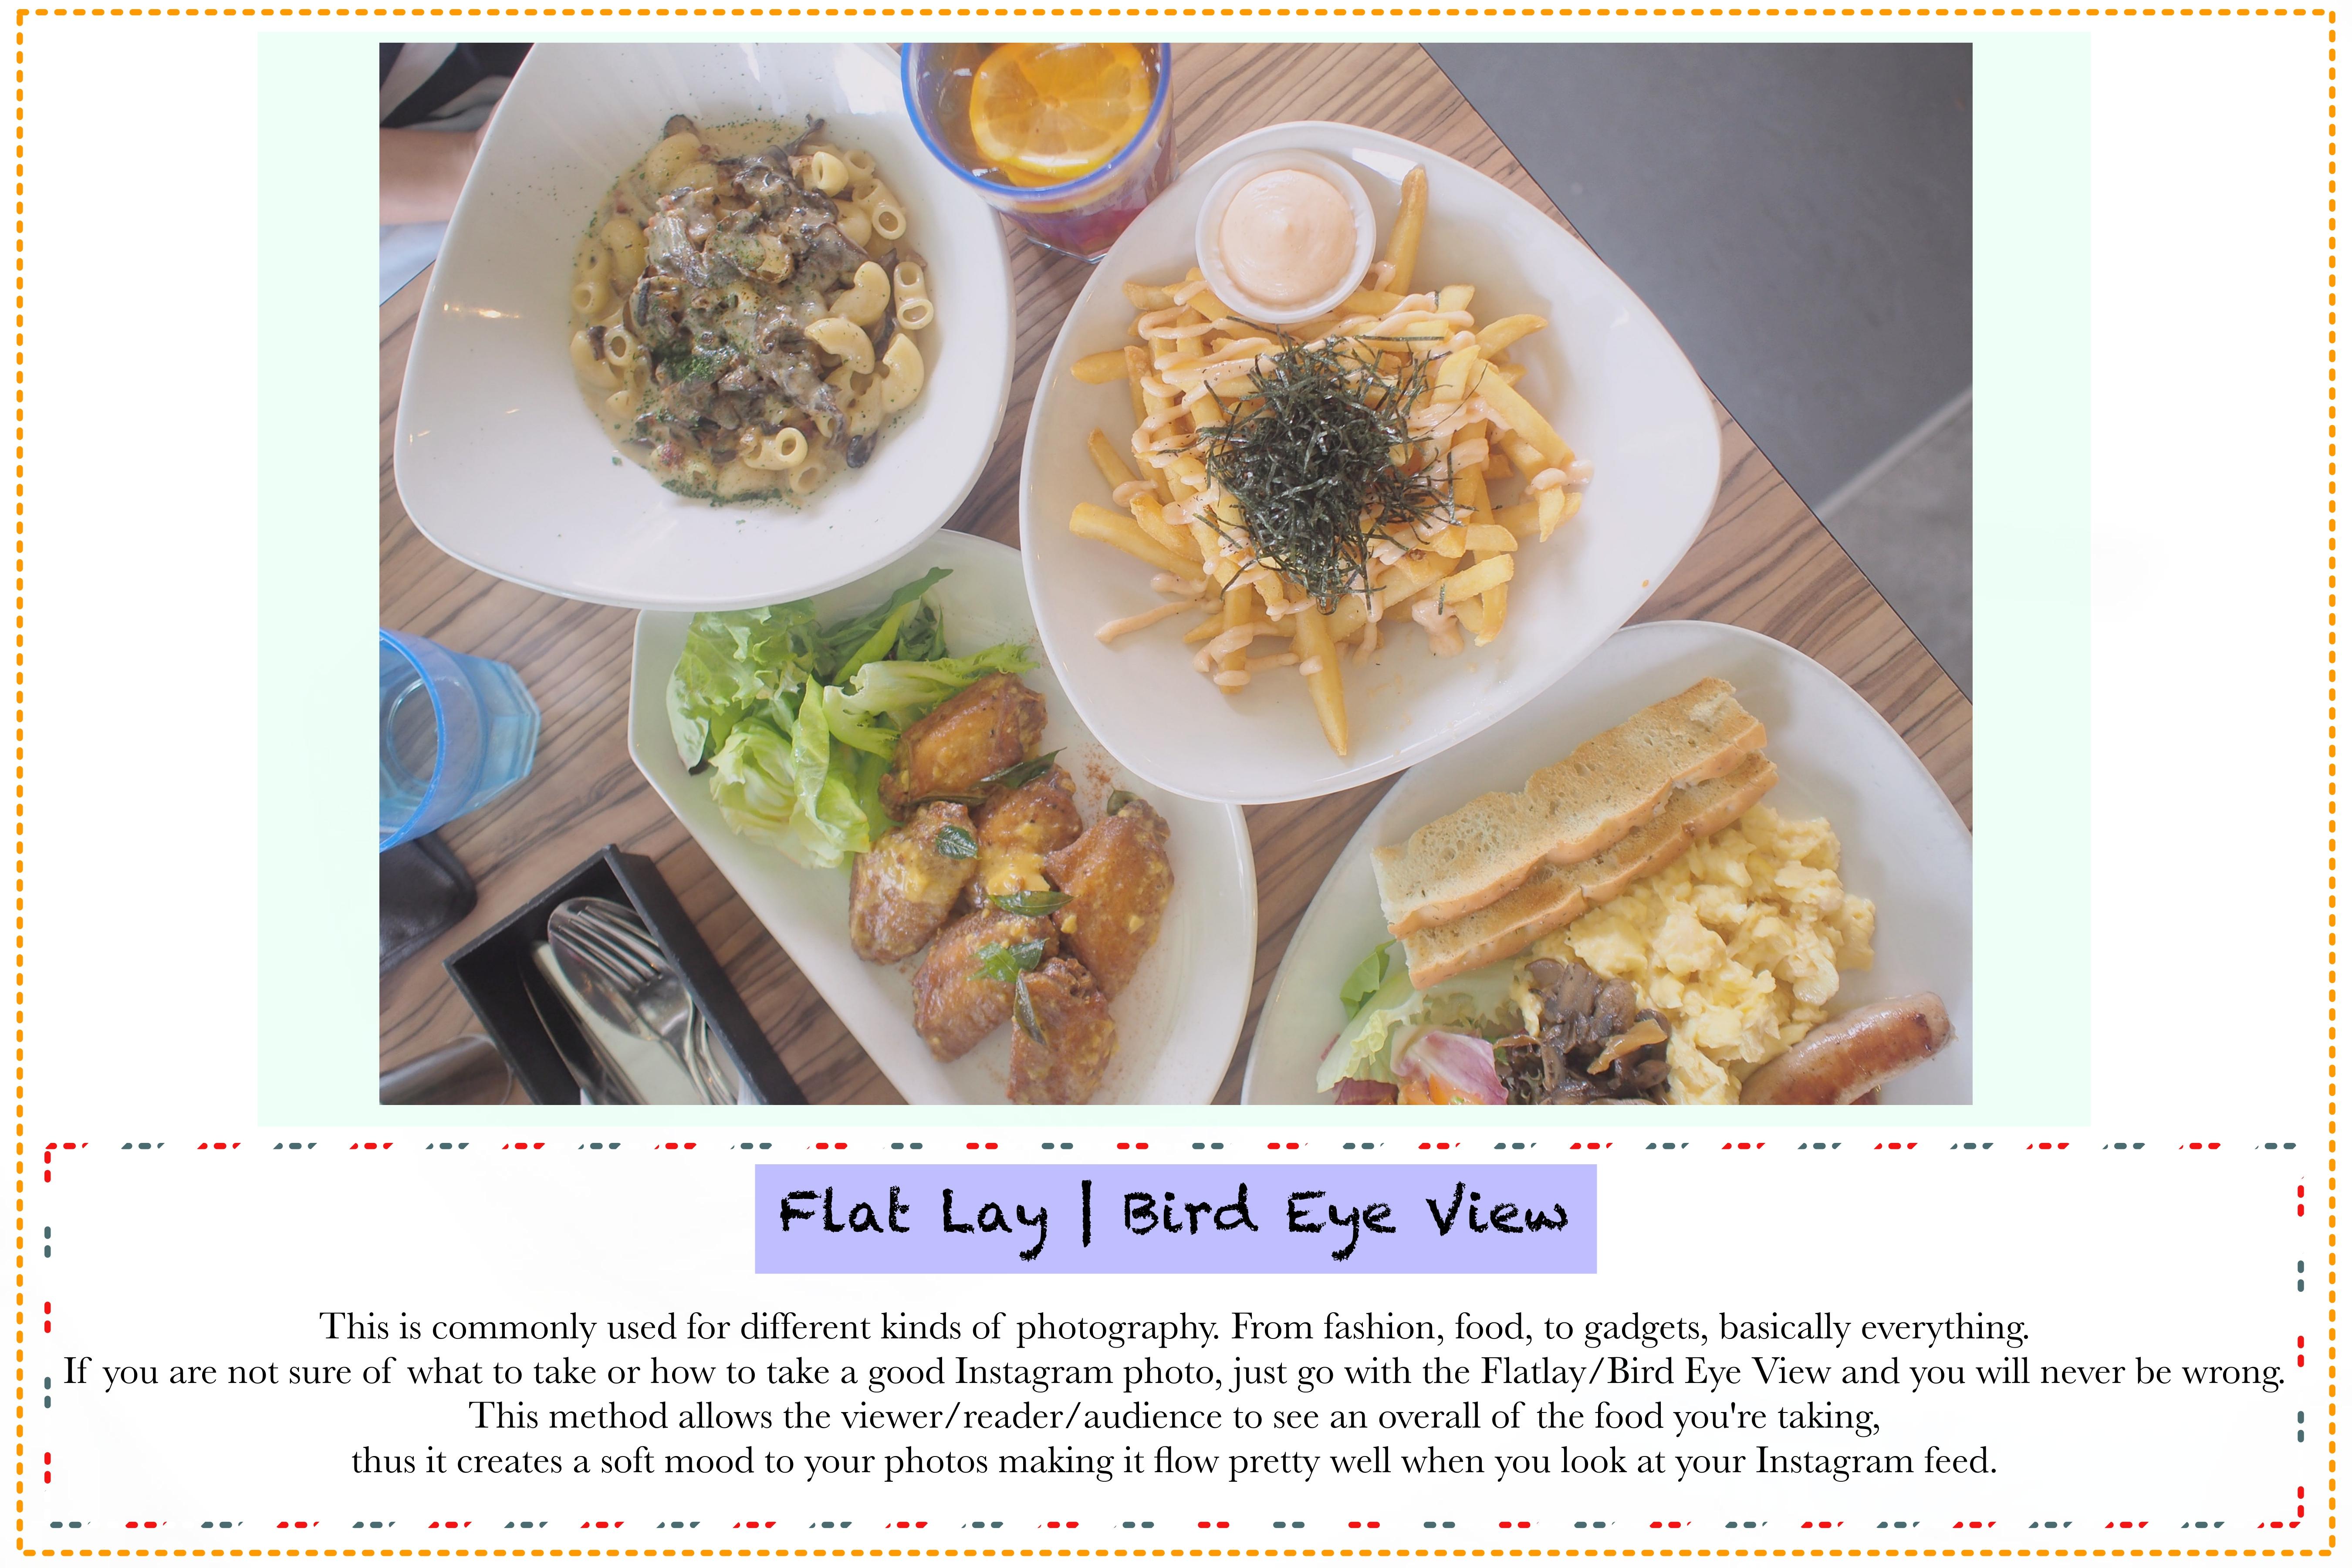 food photography 1.2